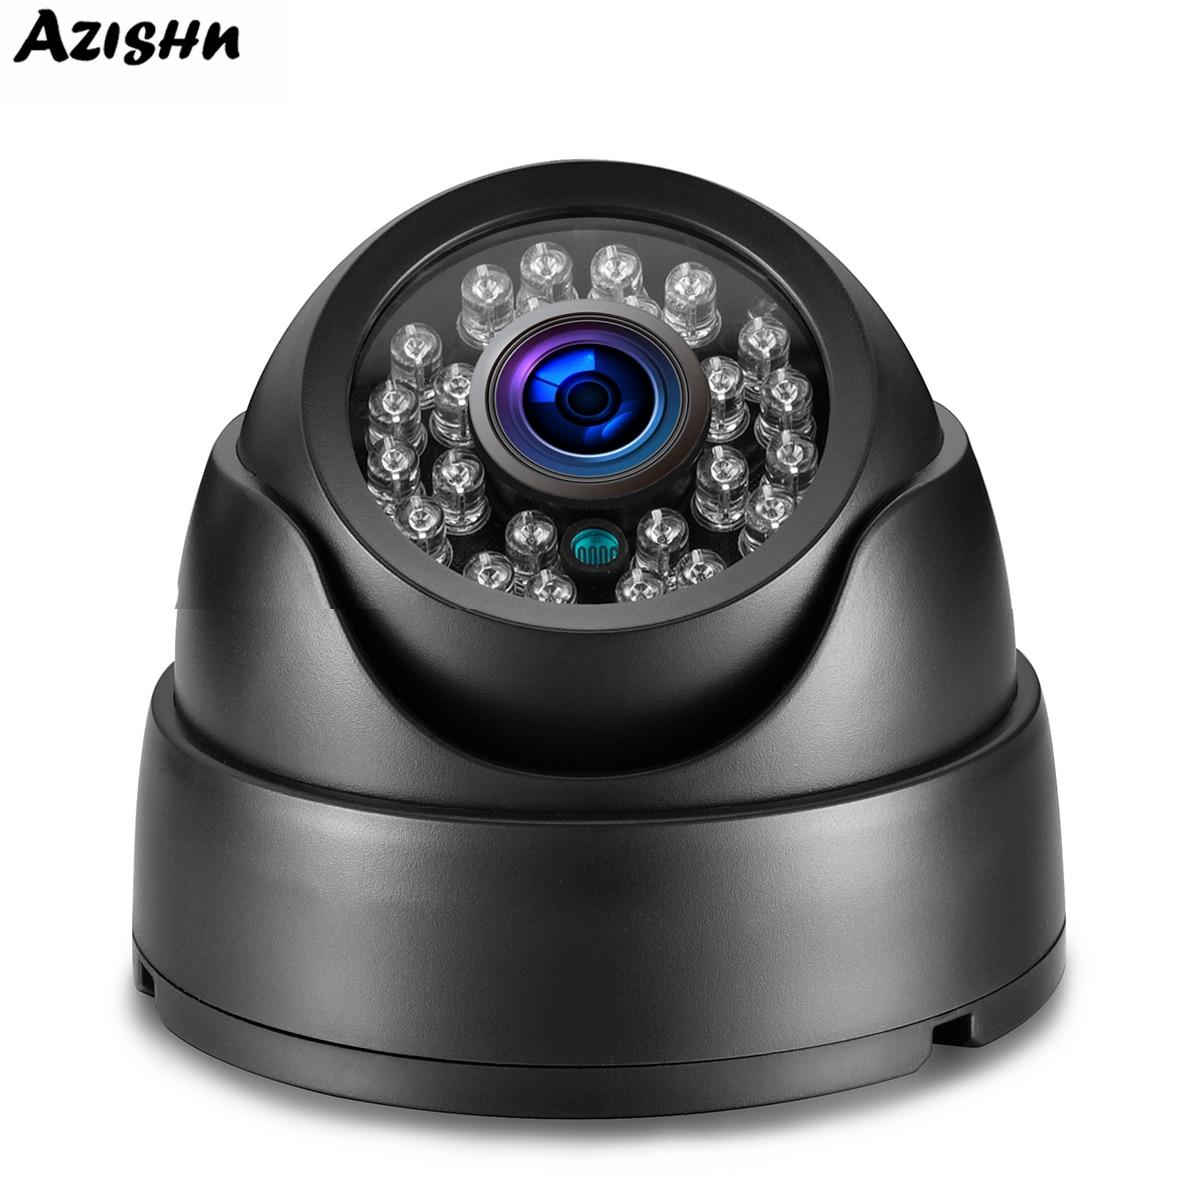 AZISHN 5MP 1080P 720P AHD Camera IR LED 25 Meter IR Distance Black Indoor CCTV Dome Security Full HD Home Surveillance Camera